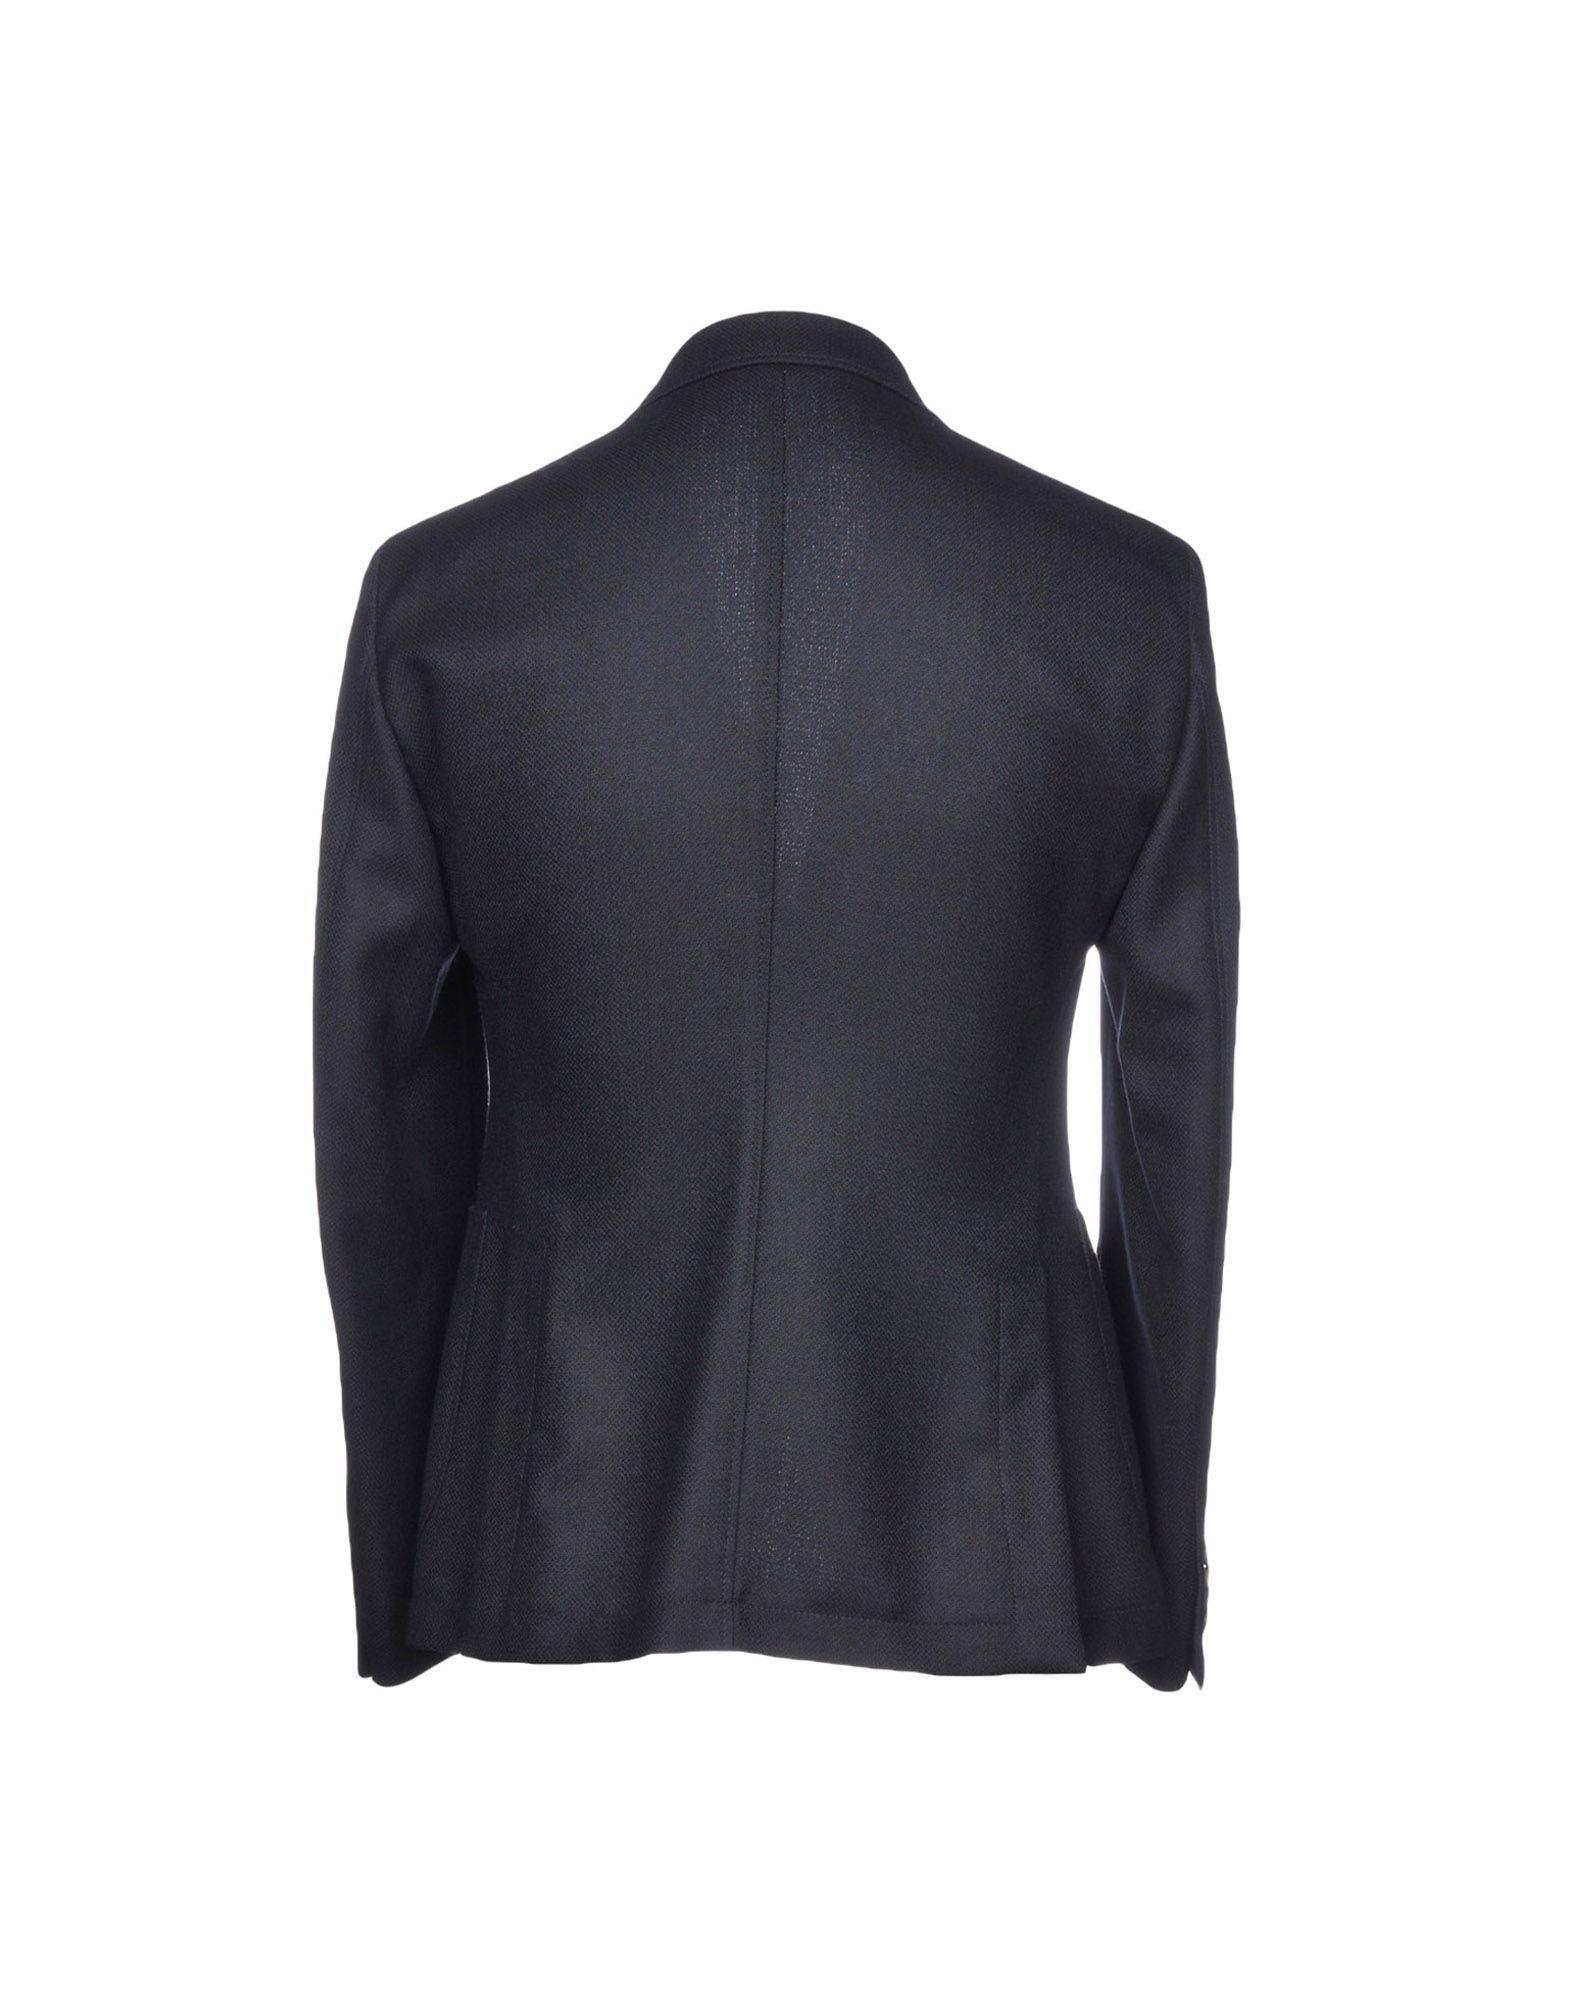 Ungaro Dark Blue Virgin Wool Single Breasted Blazer